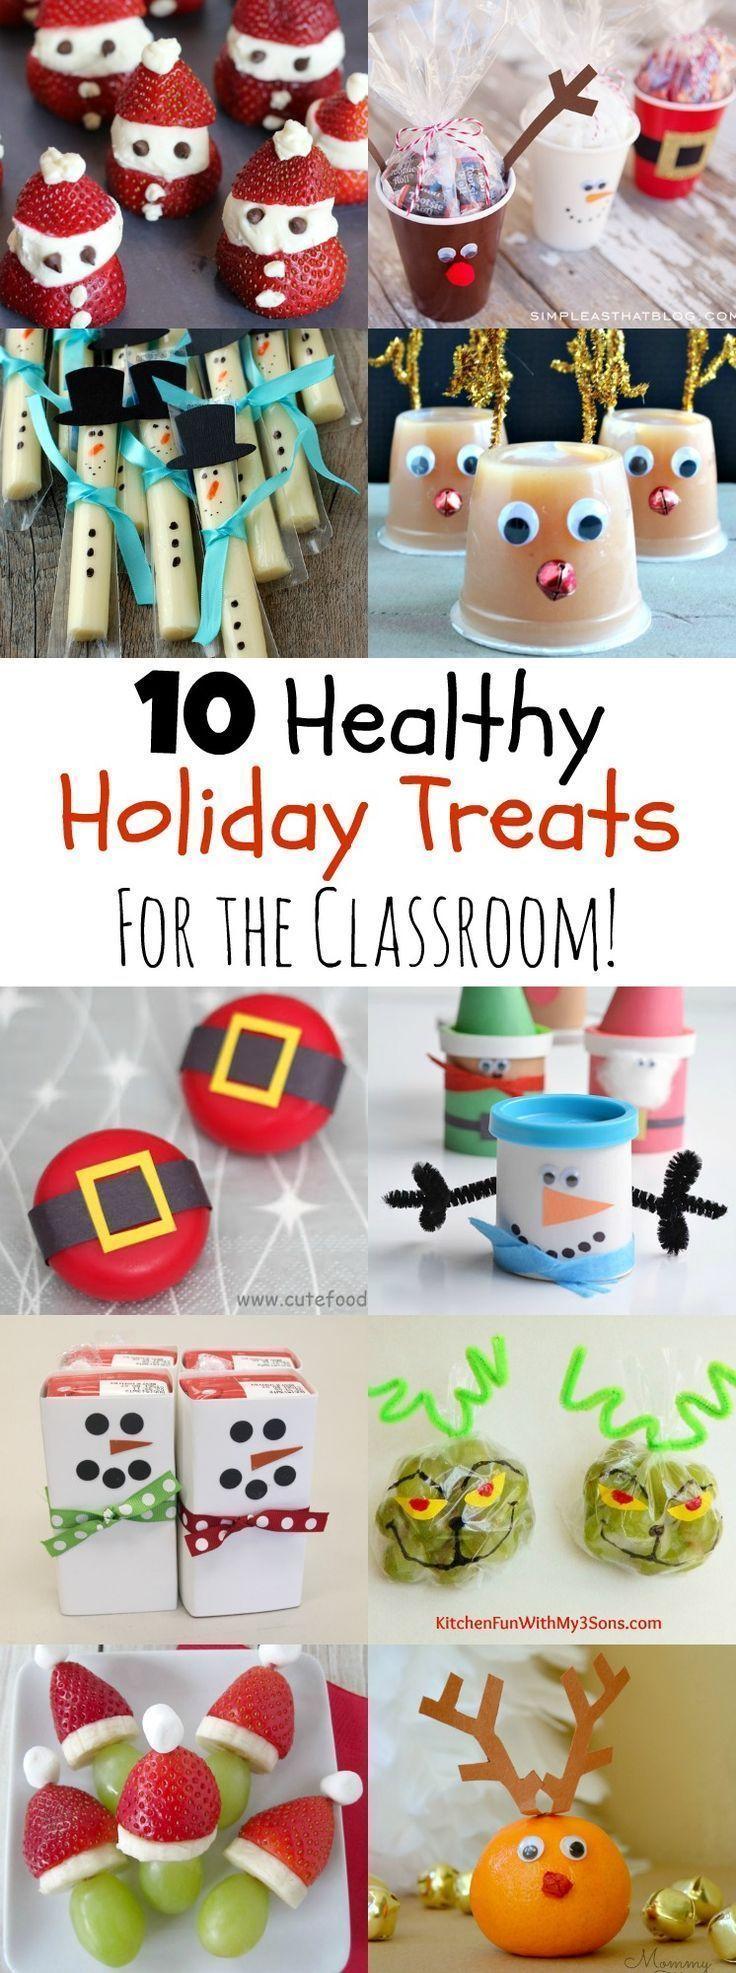 Best 25+ School holiday party ideas on Pinterest | School ...